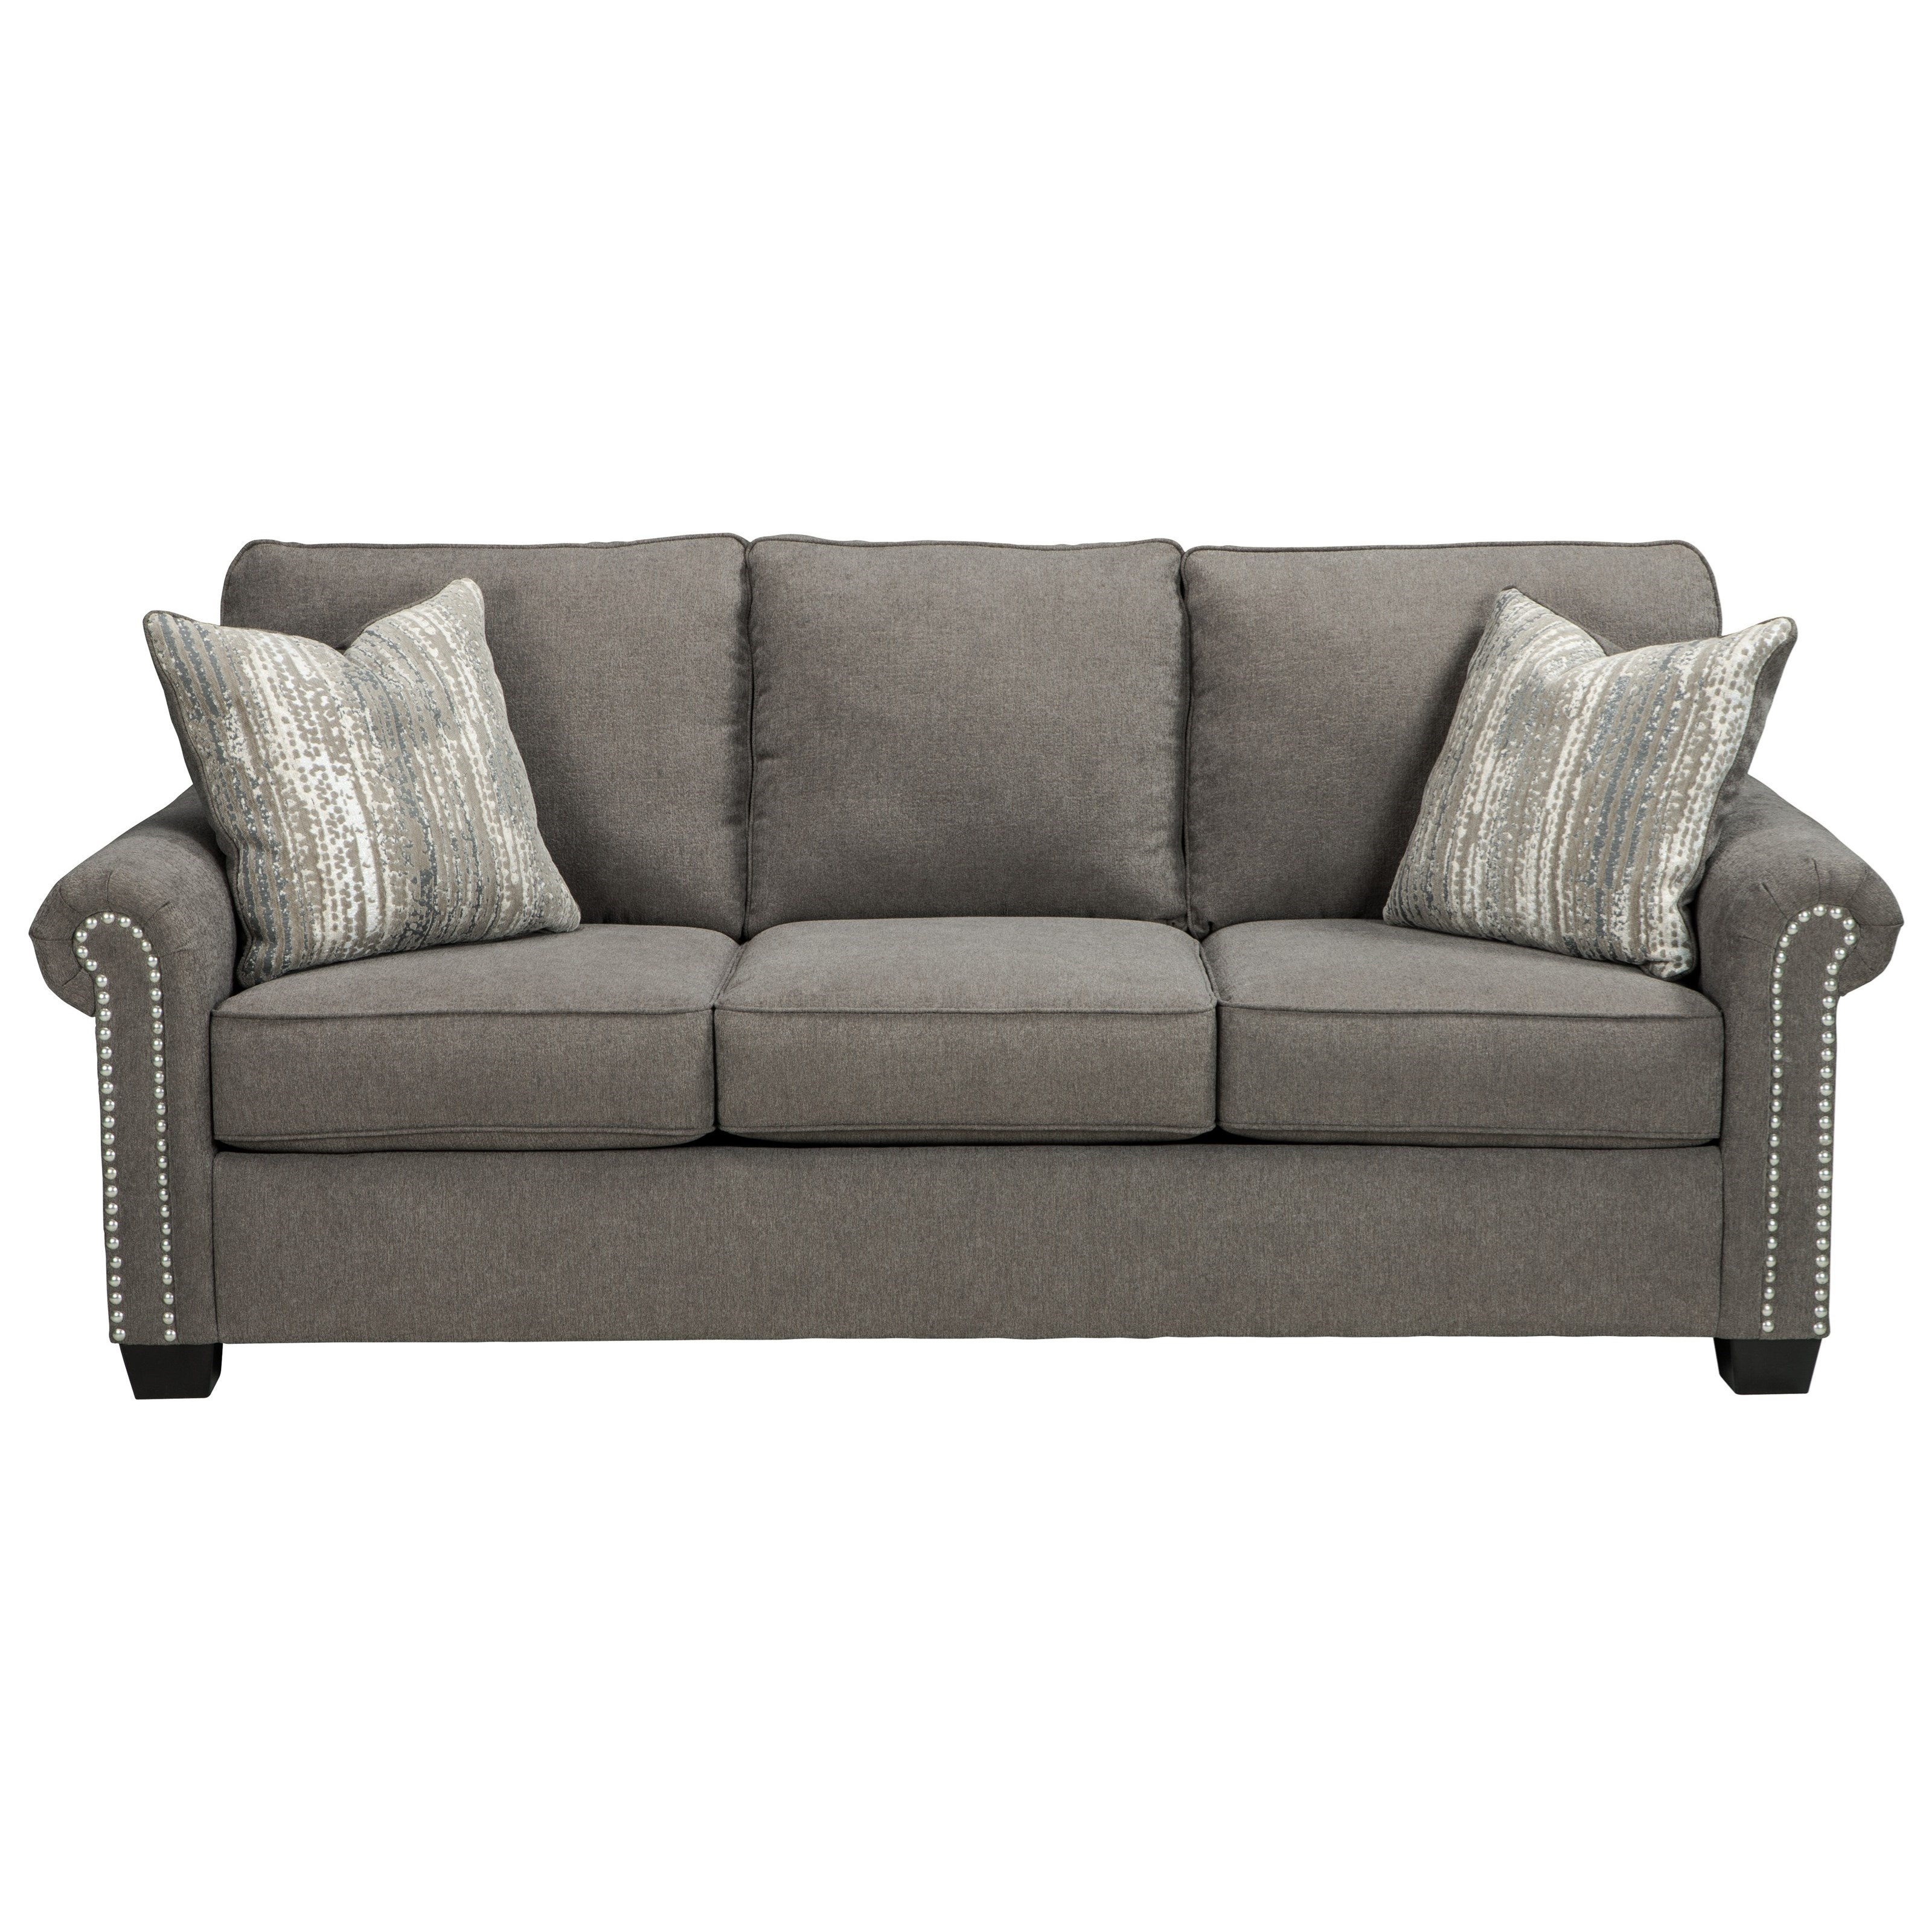 Benchcraft Gilman Sofa - Item Number: 9260238